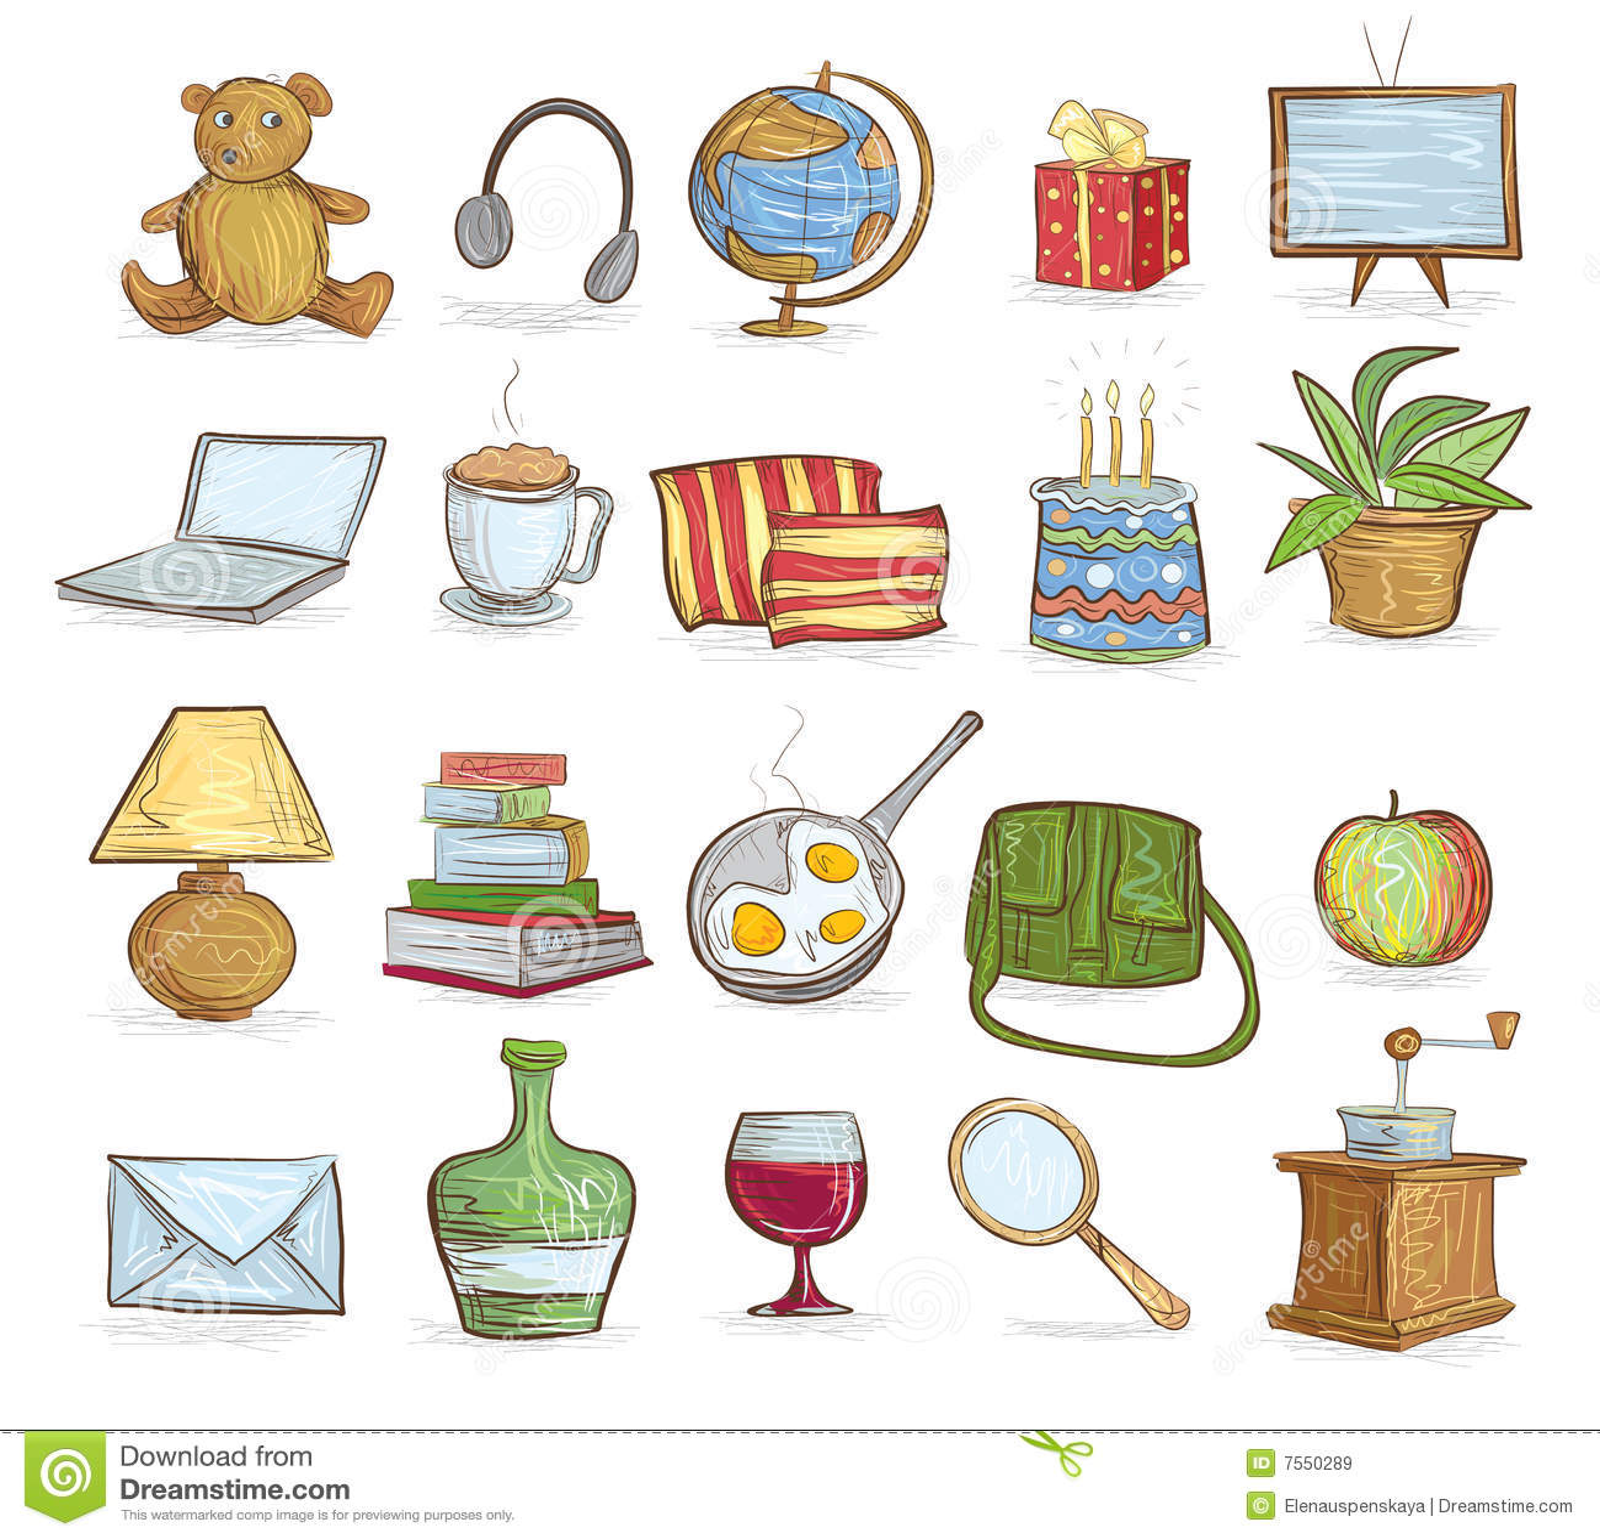 Objetos del hogar ilustraci n del vector ilustraci n de for Objetos decorativos para el hogar